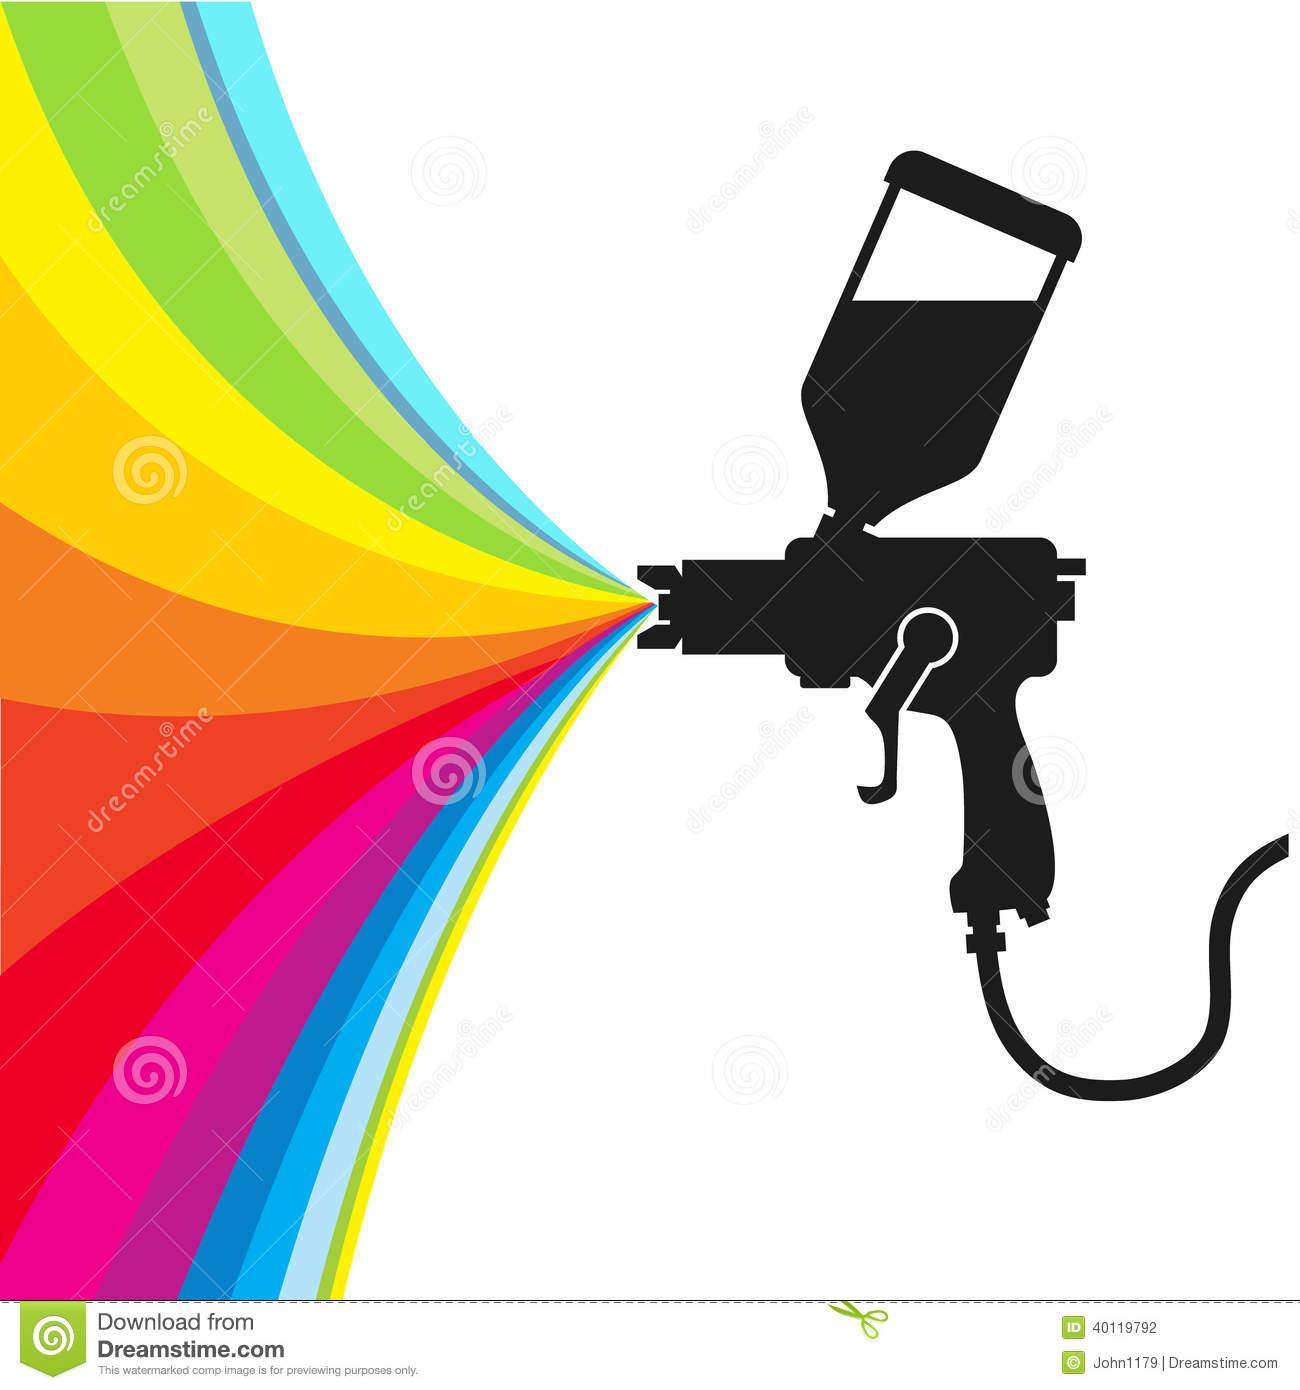 Paint spray gun clipart.